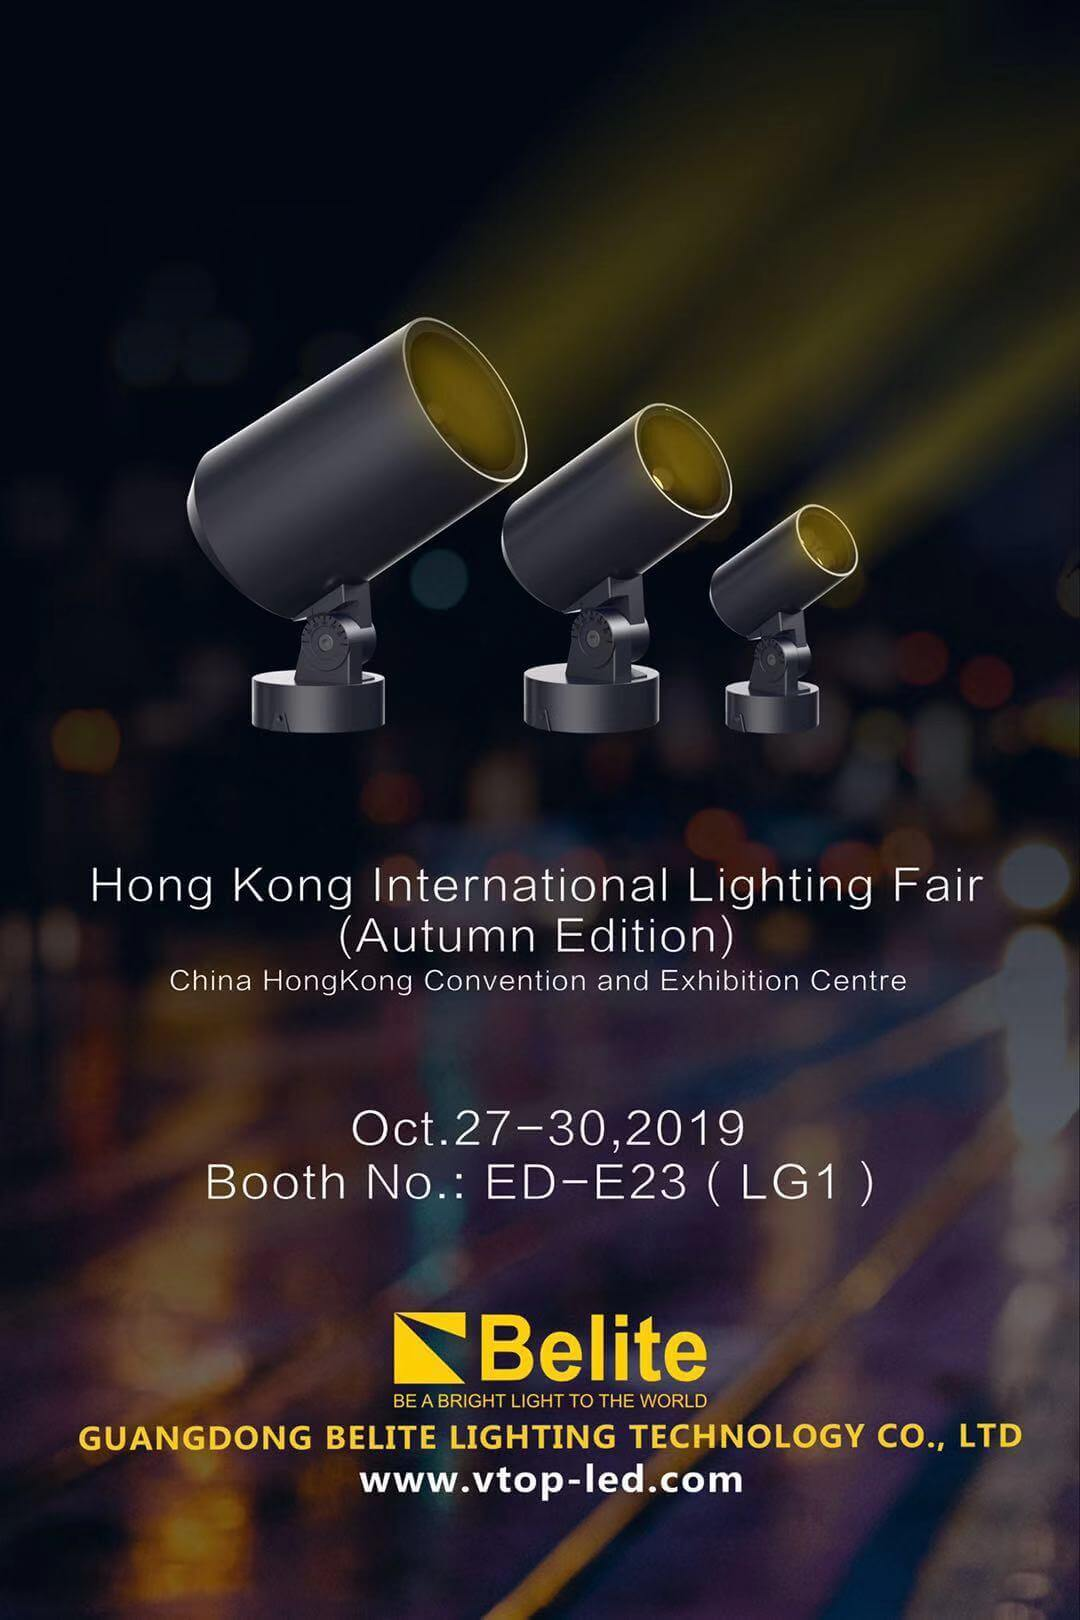 Hong Kong International Lighting Fair Invitation